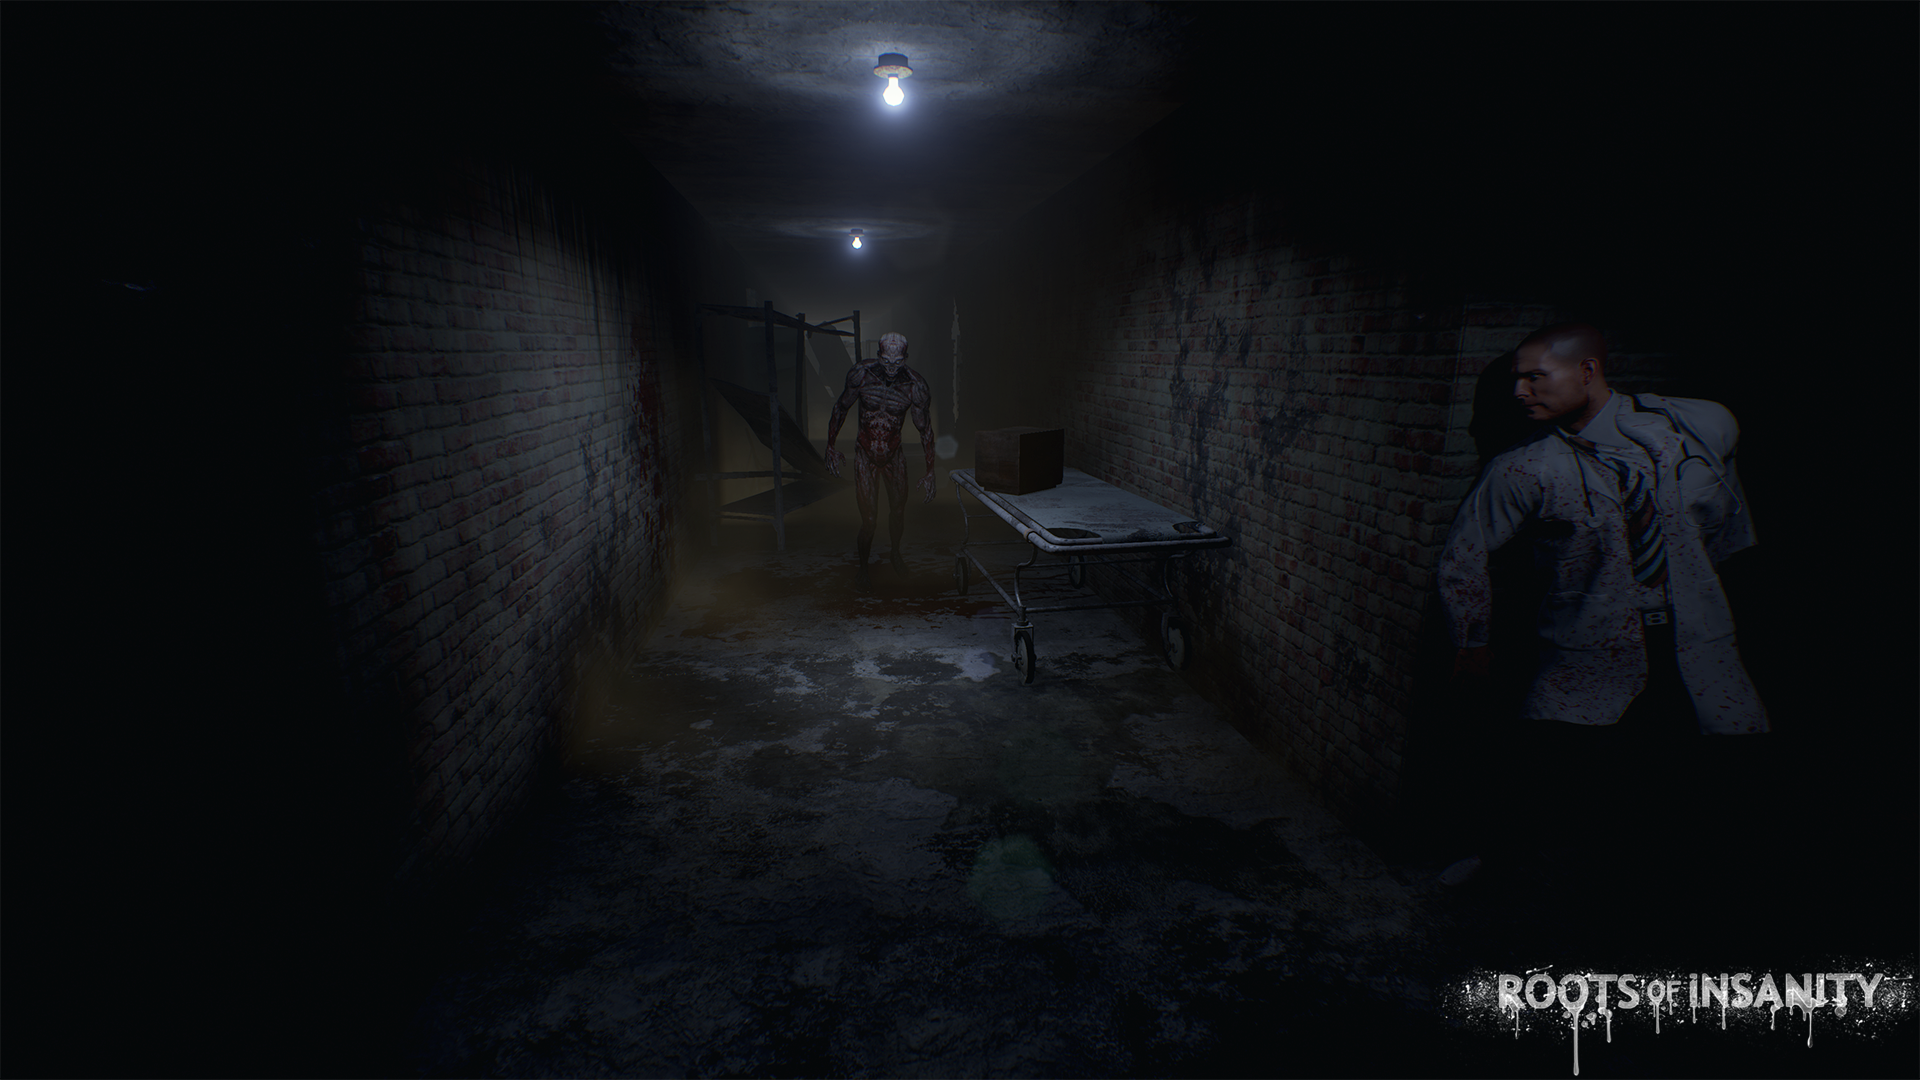 Roots of Insanity screenshots